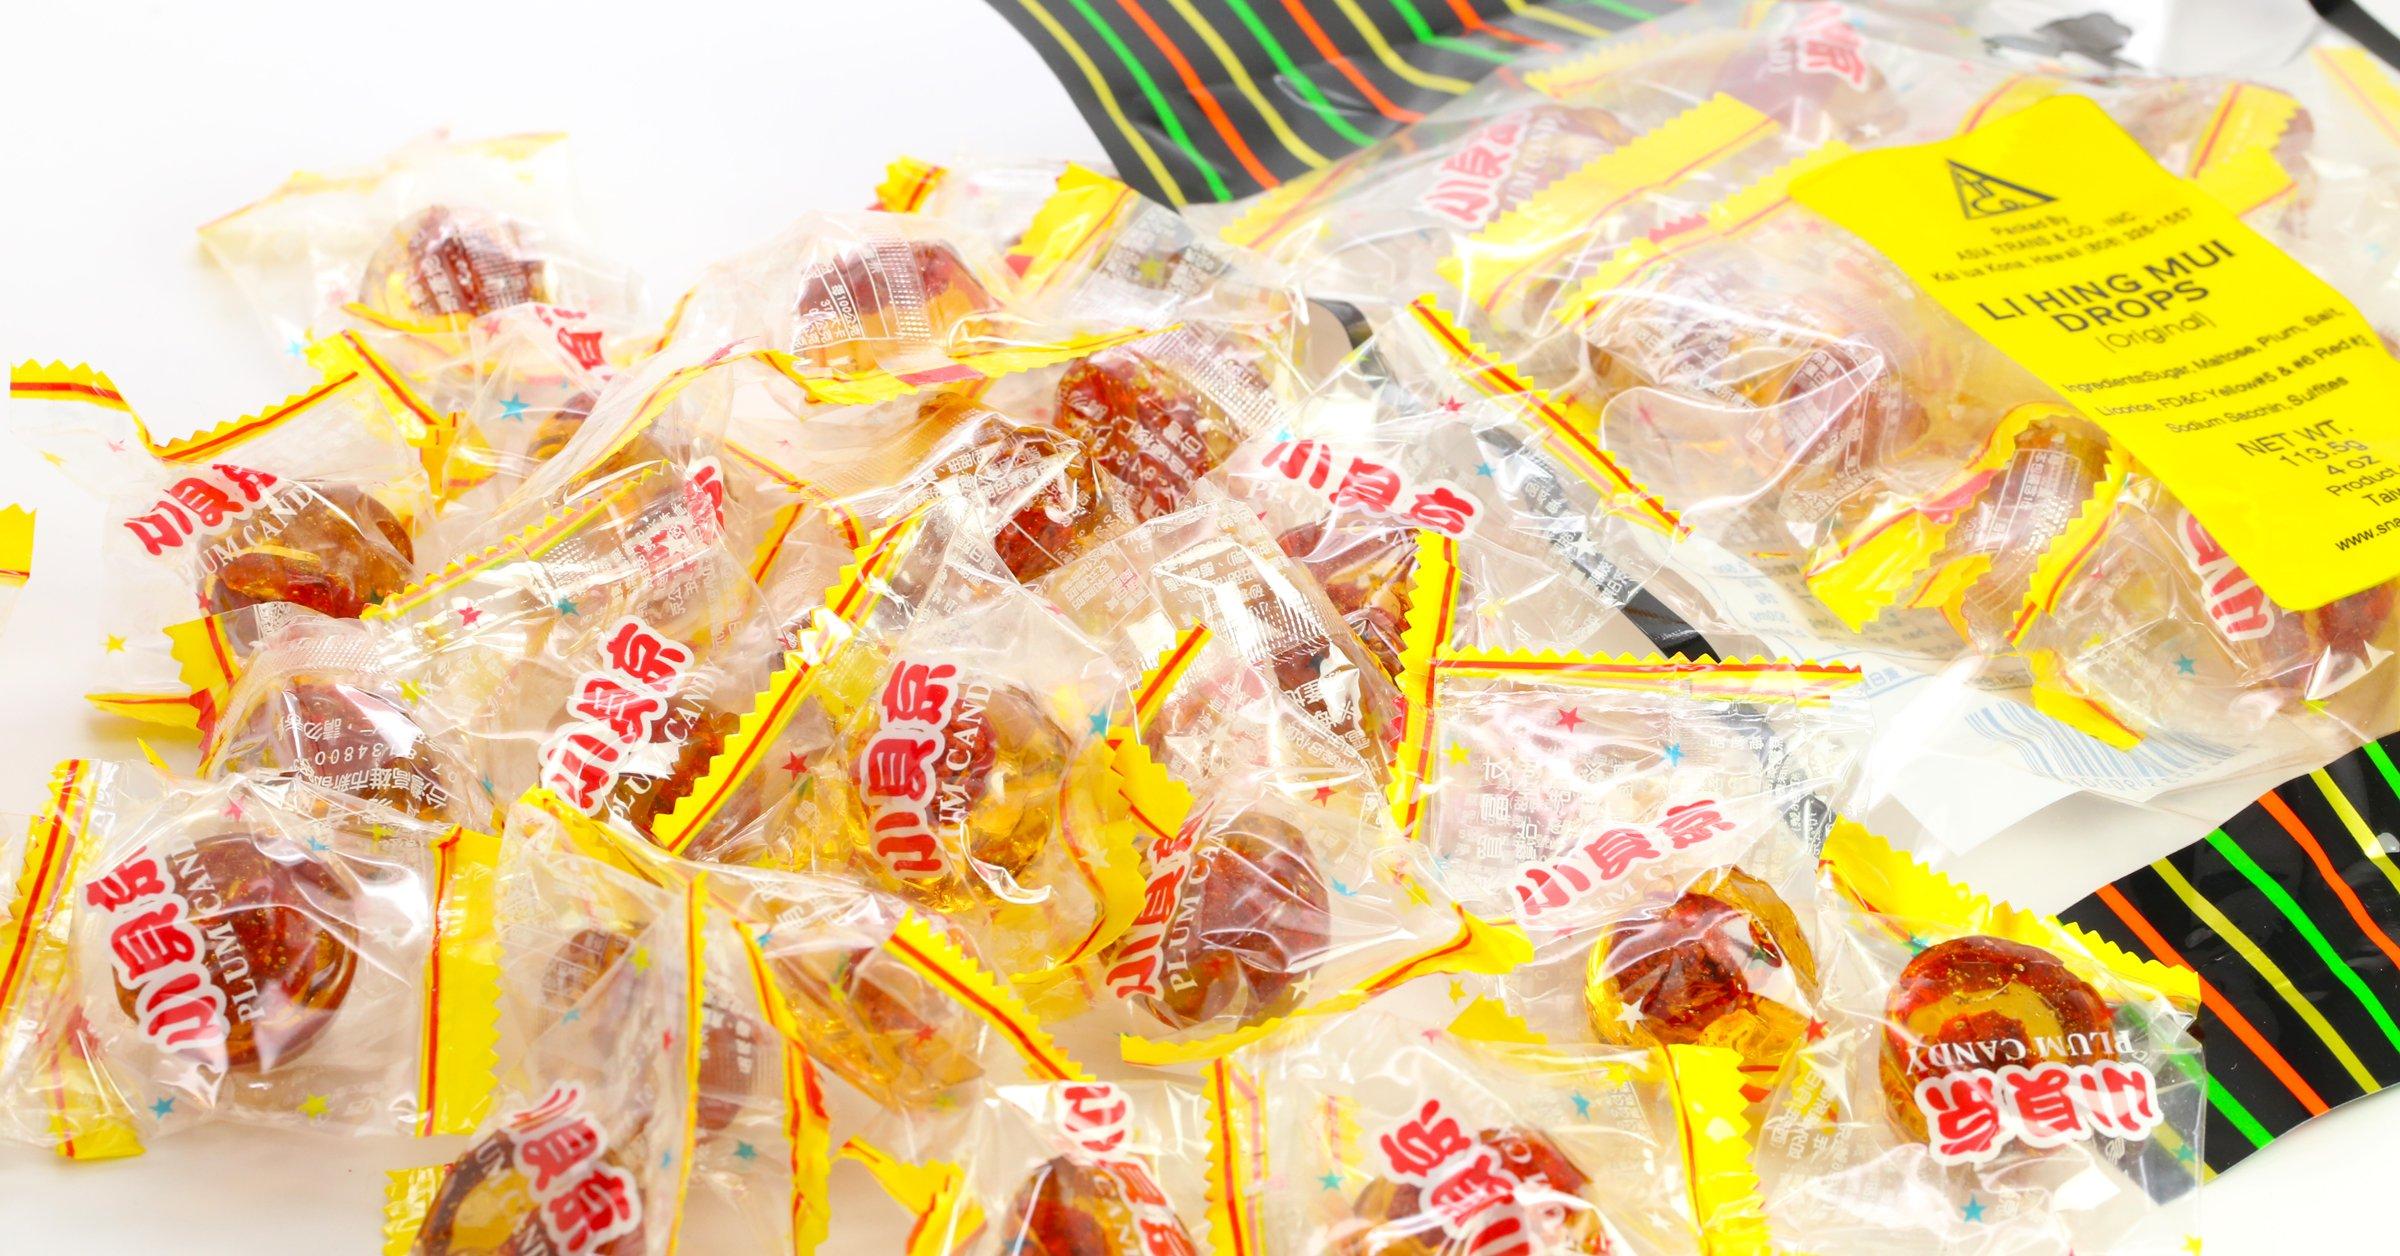 Li Hing Mui Drops (Golden Plum) (3 POUNDS)